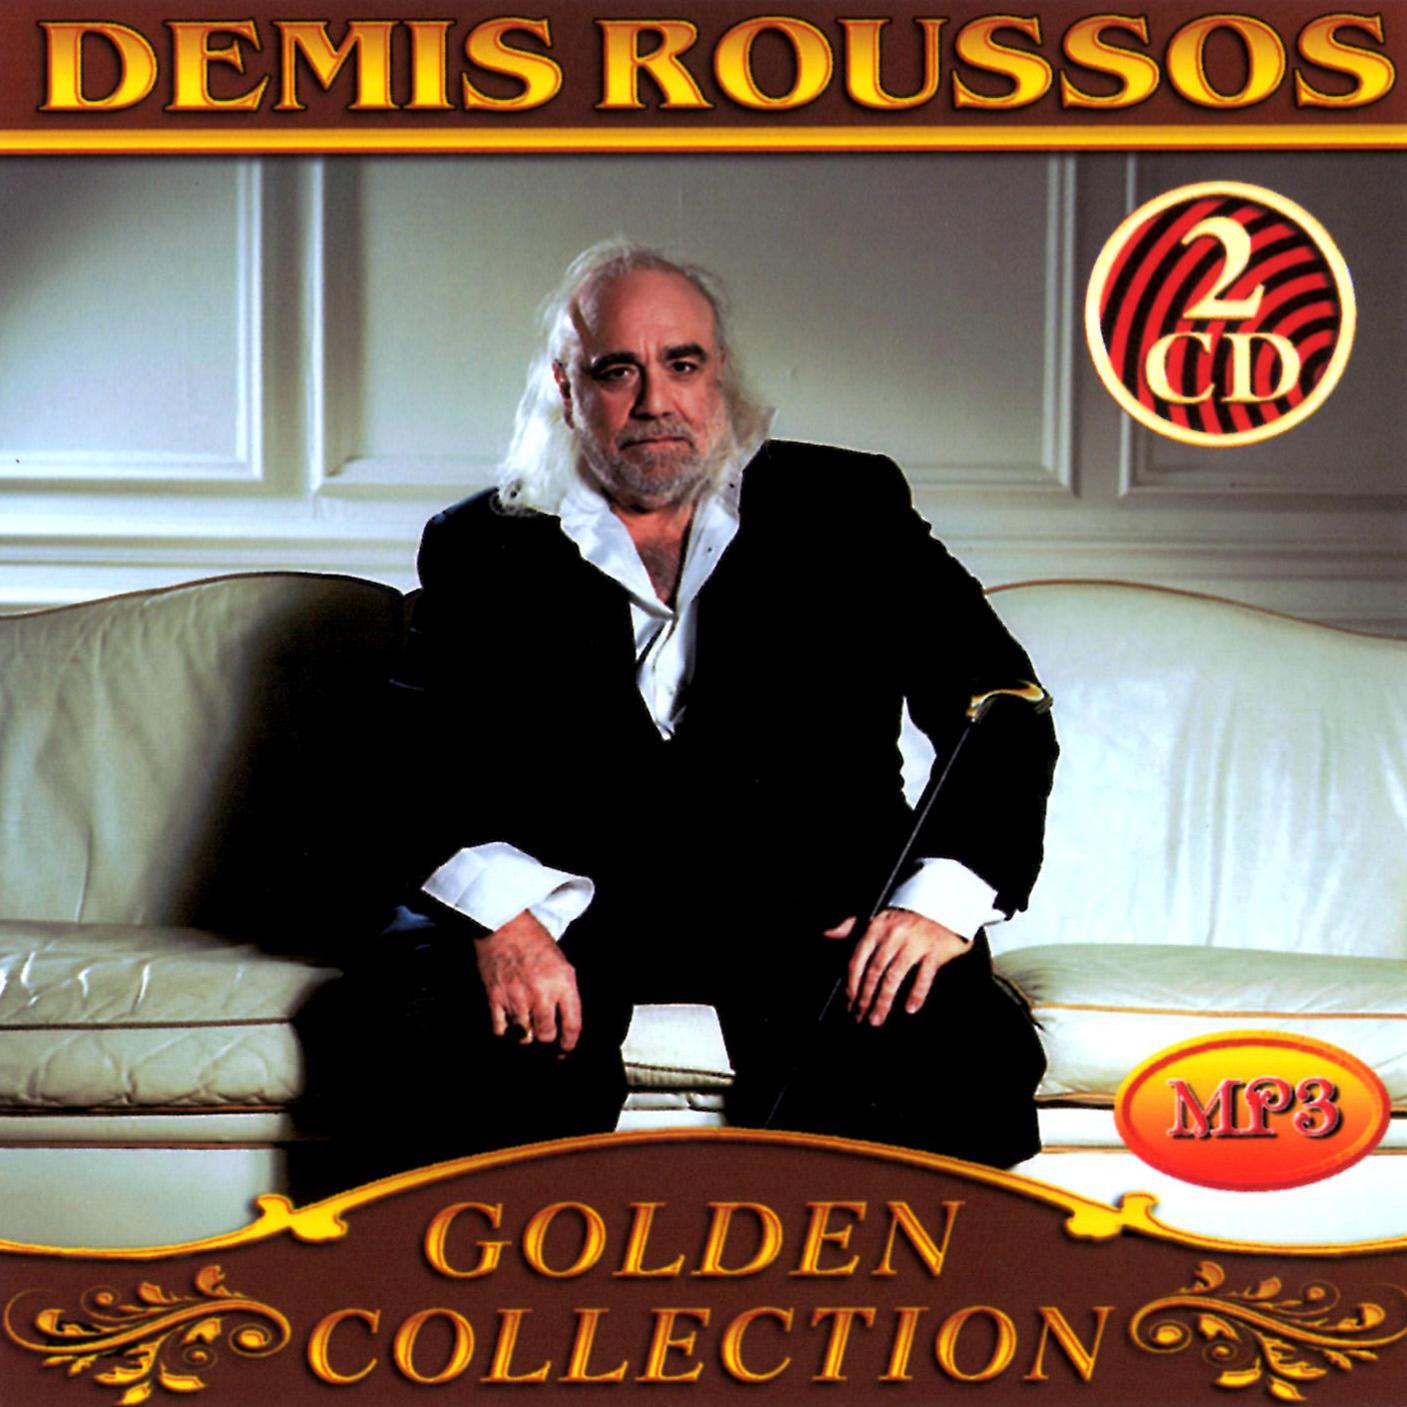 Demis Roussos 2cd [mp3]